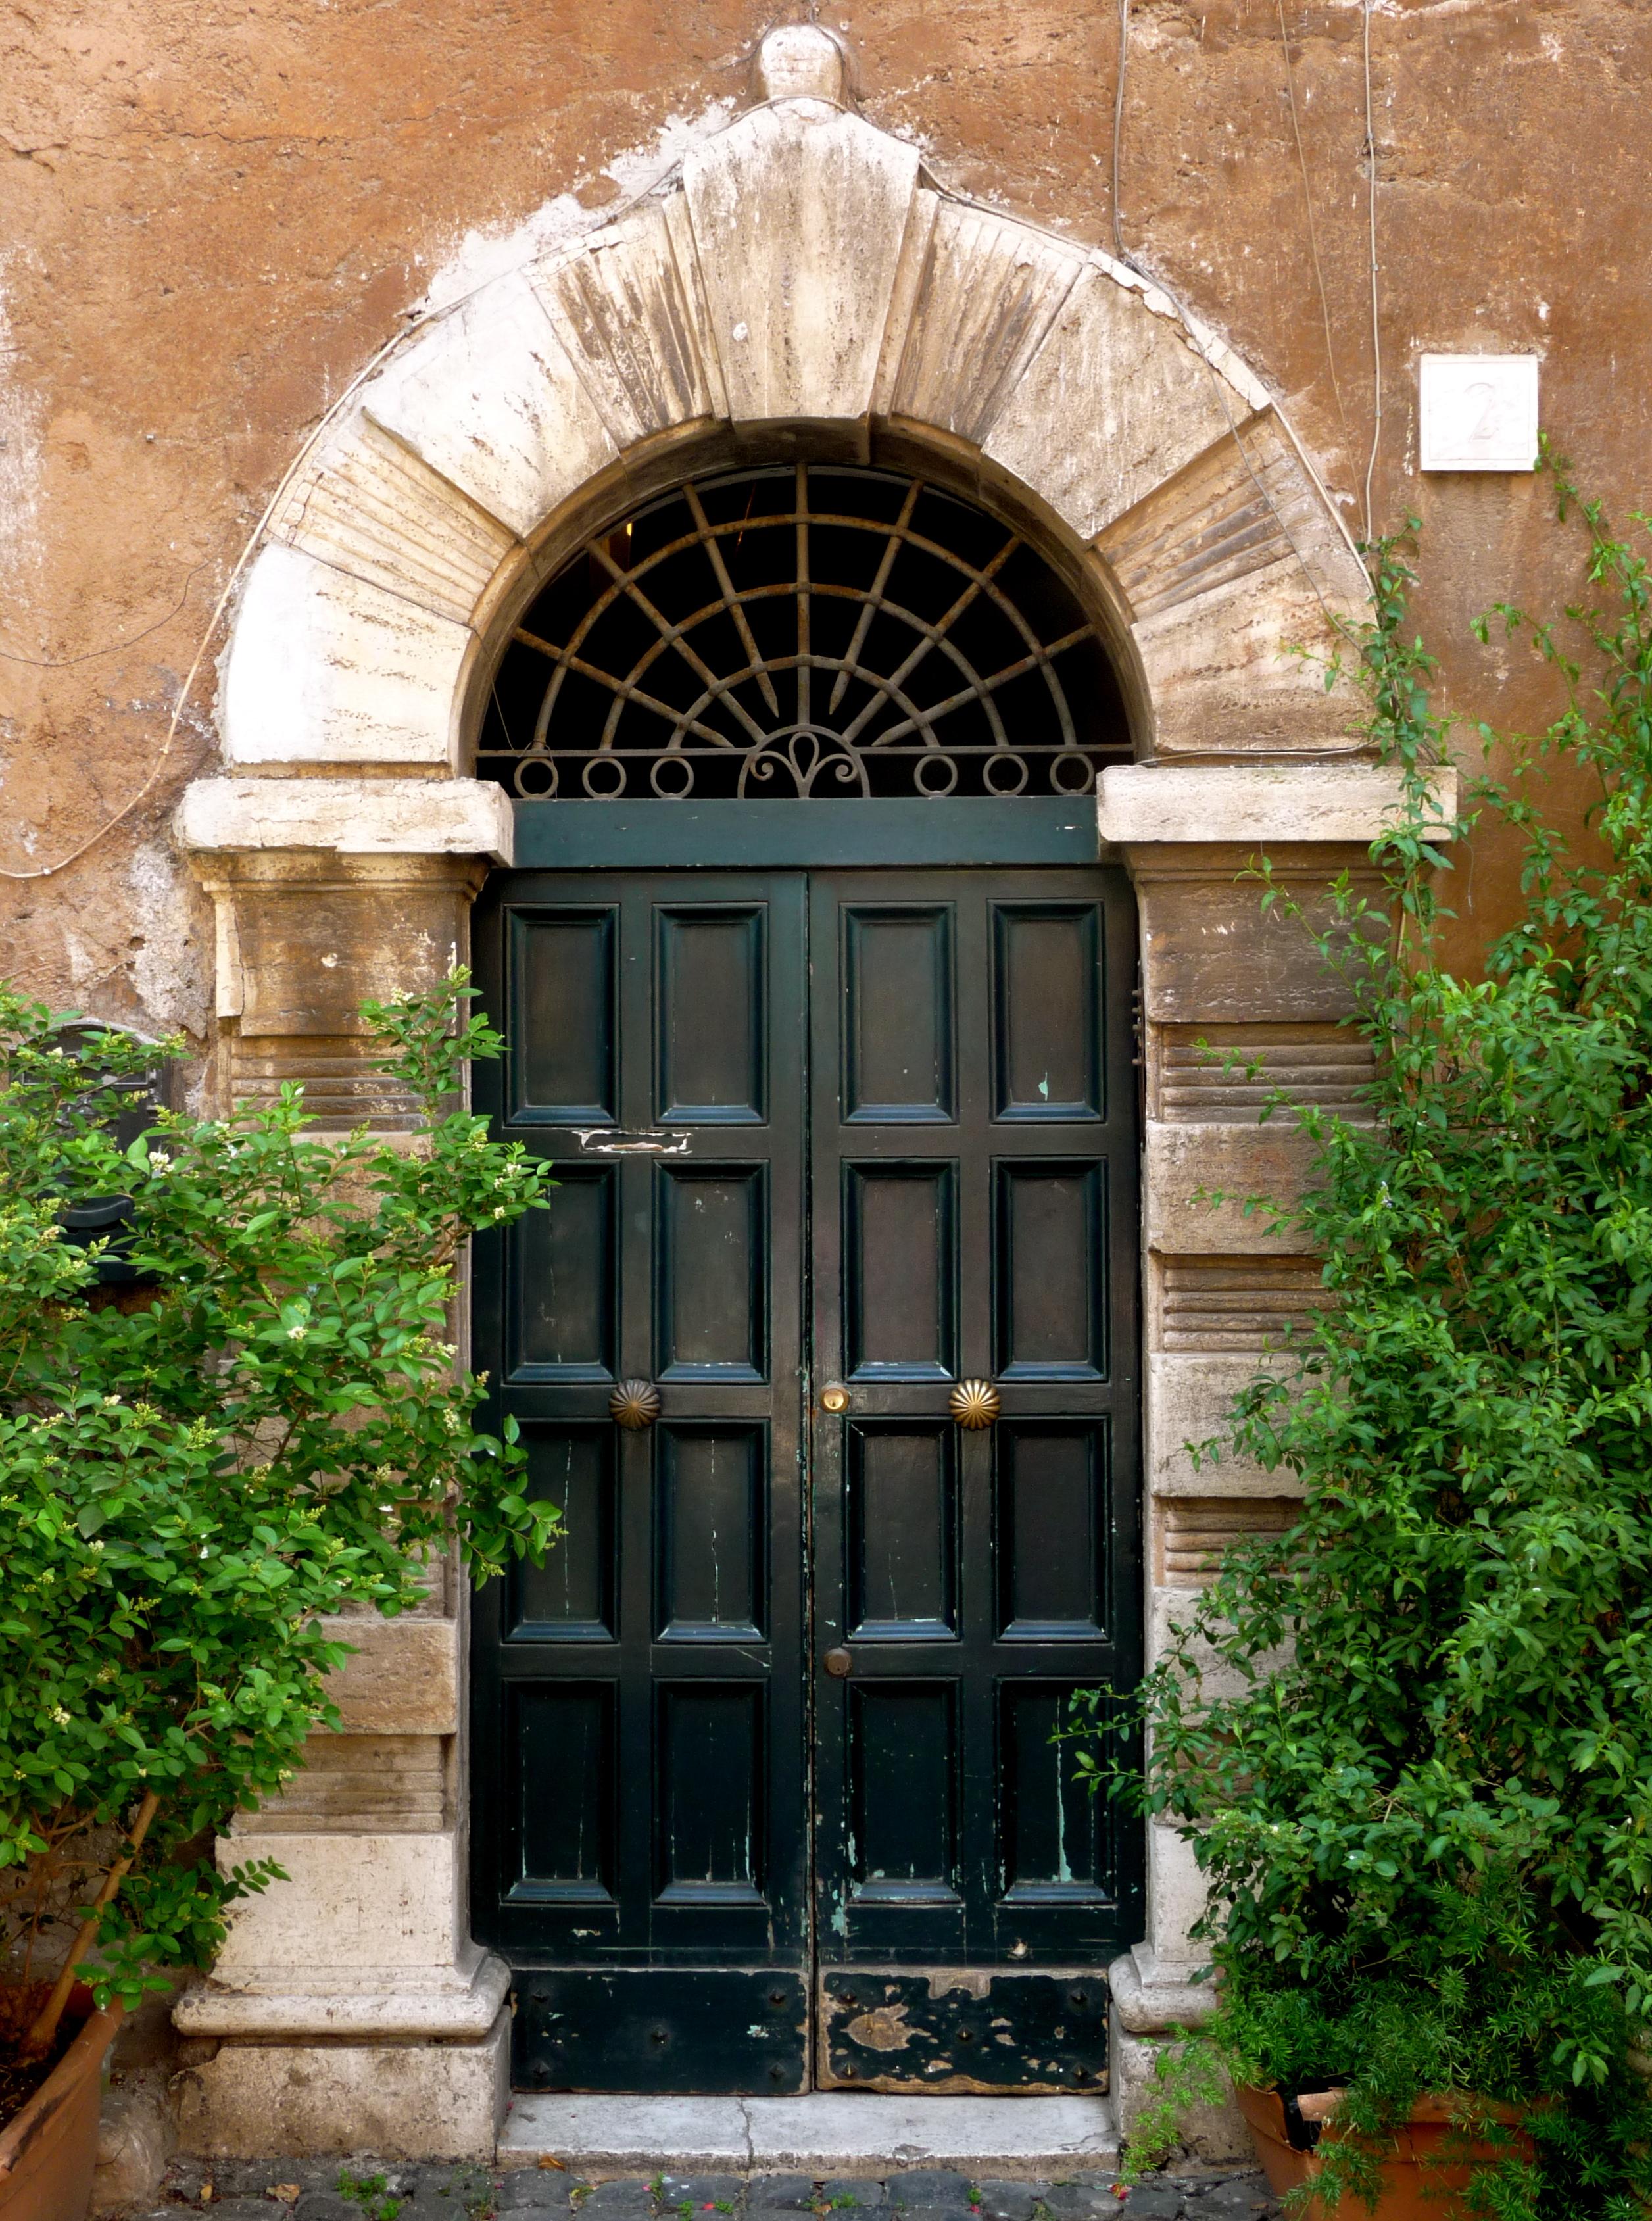 P1020099 & Those Roman Doors - Melange Travel